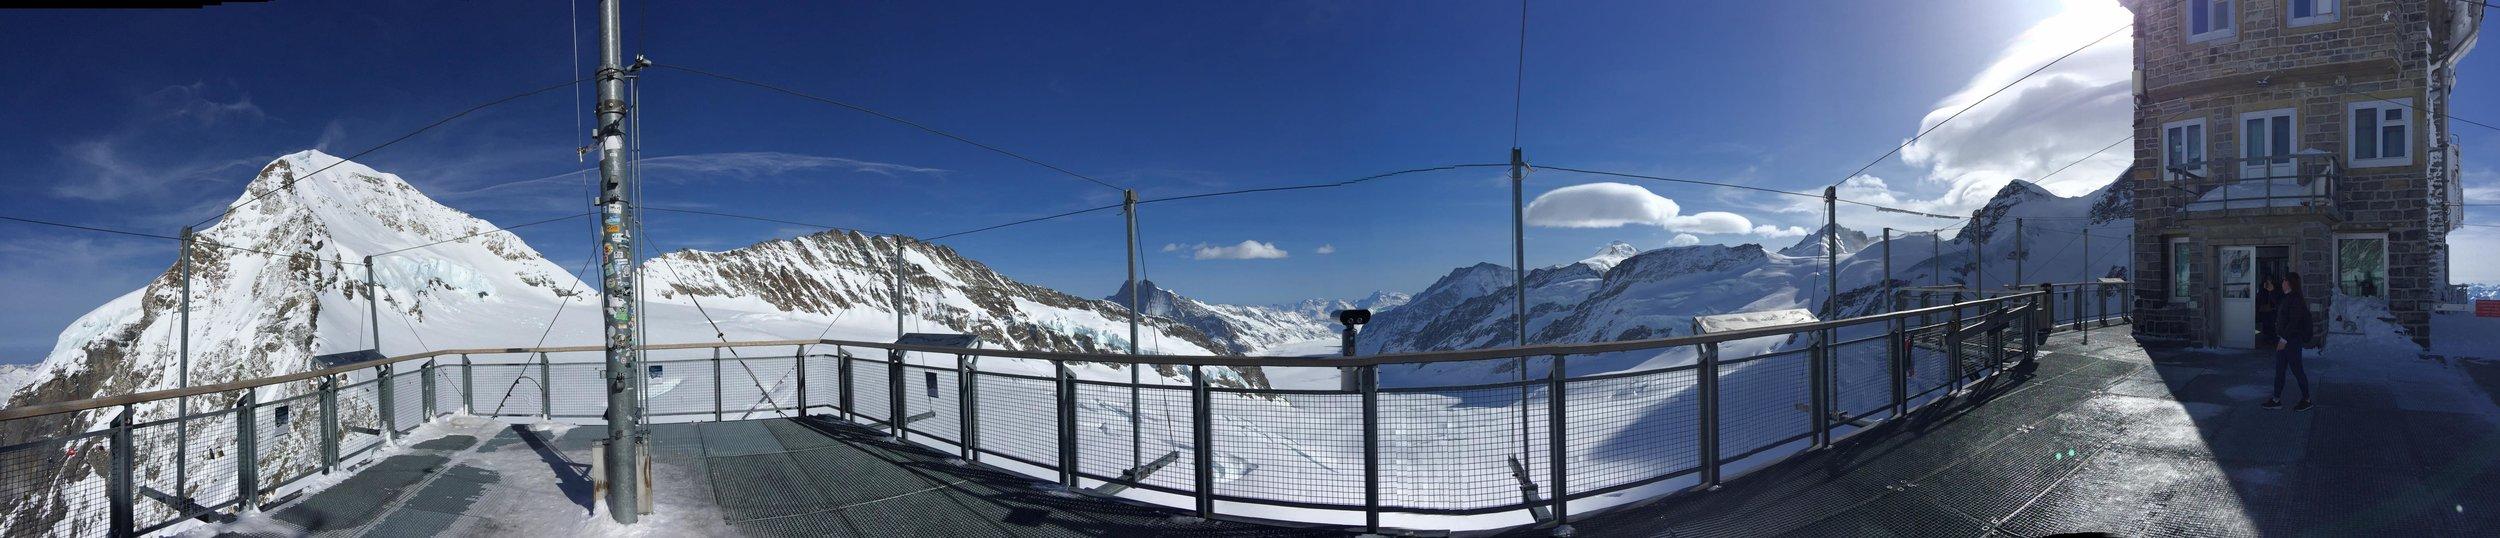 "Jungfraujoch ""Top of Europe"", March 2017"